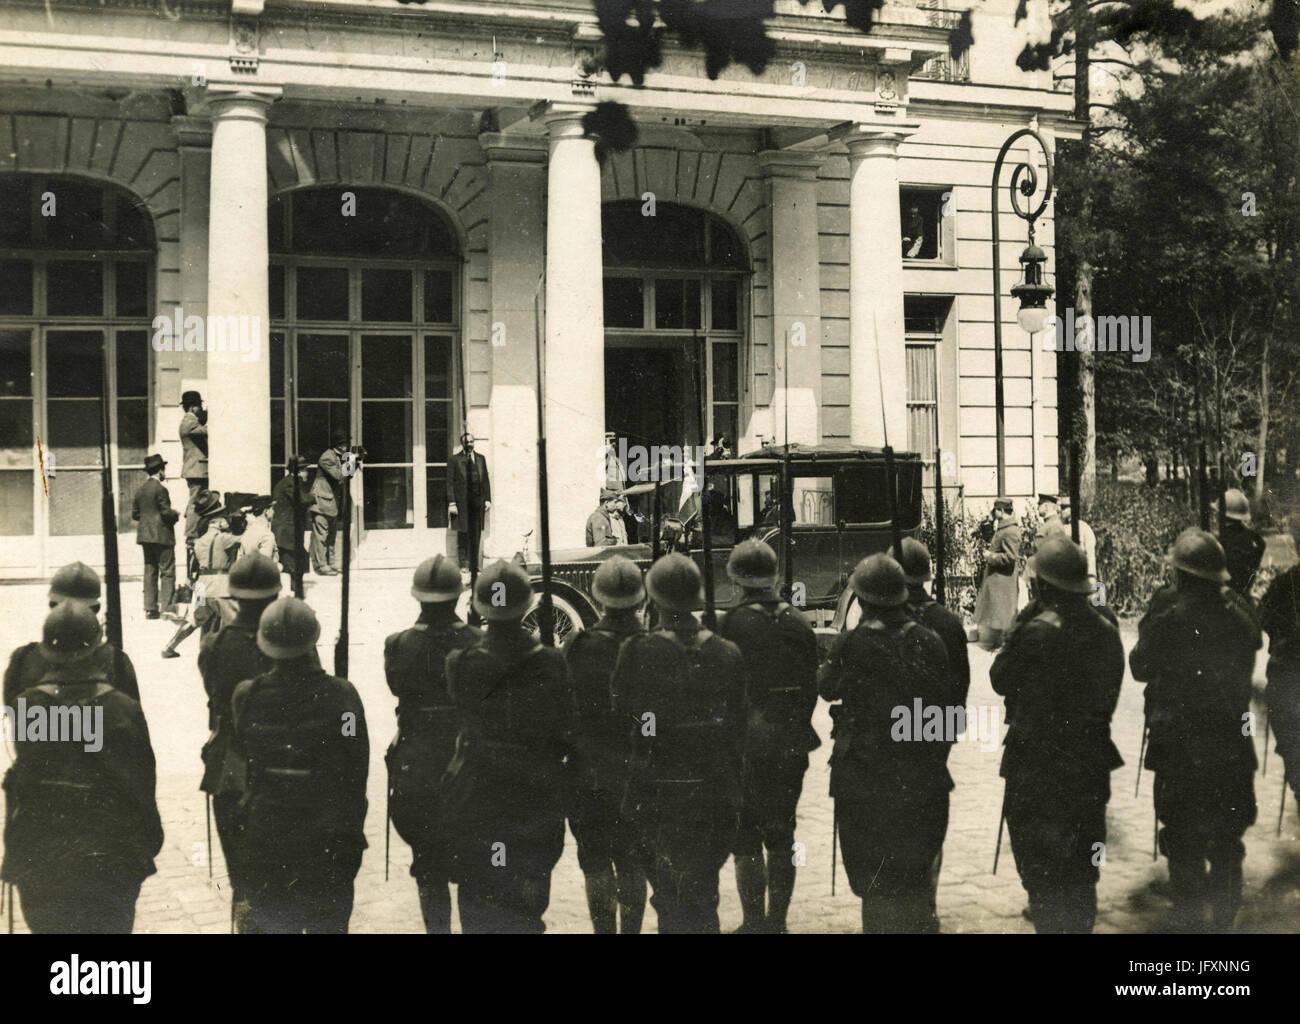 PM francese Georges Clemenceau arriva a Versailles per il Trattato di pace dopo WW1, Francia Immagini Stock